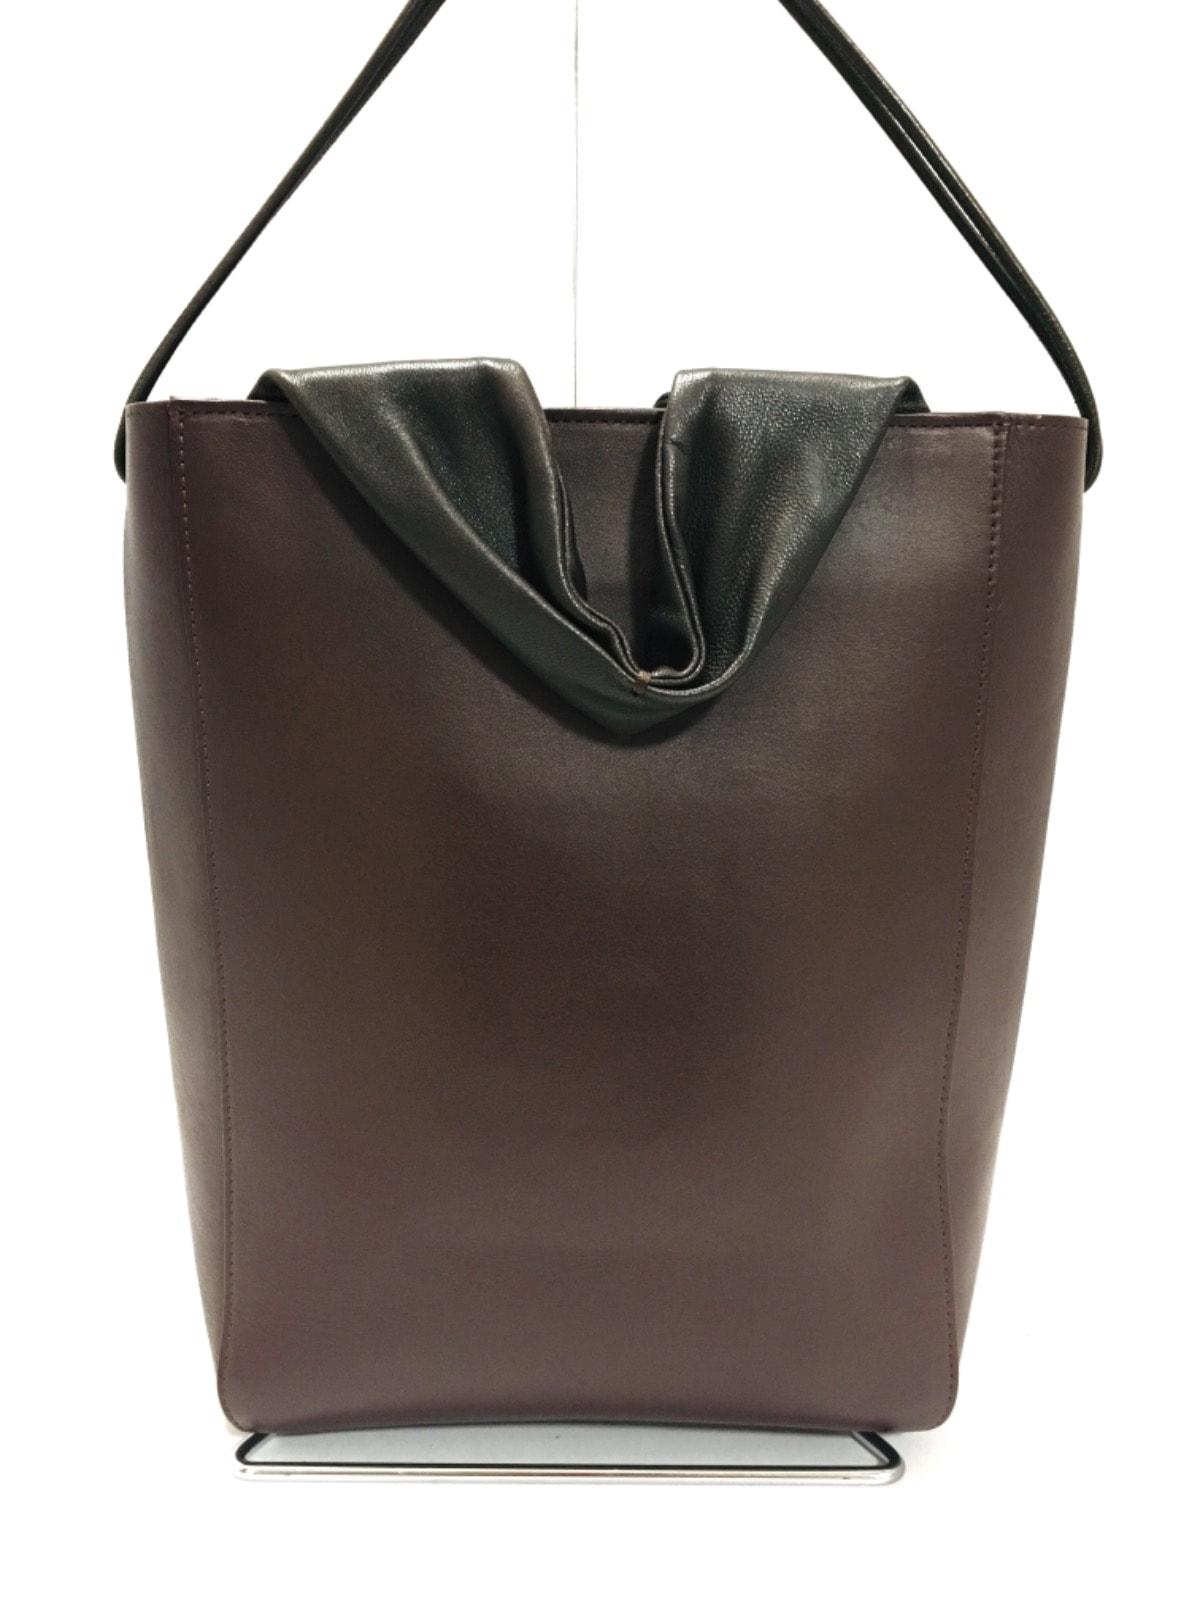 MARY AL TERNA(メアリオルターナ)のショルダーバッグ